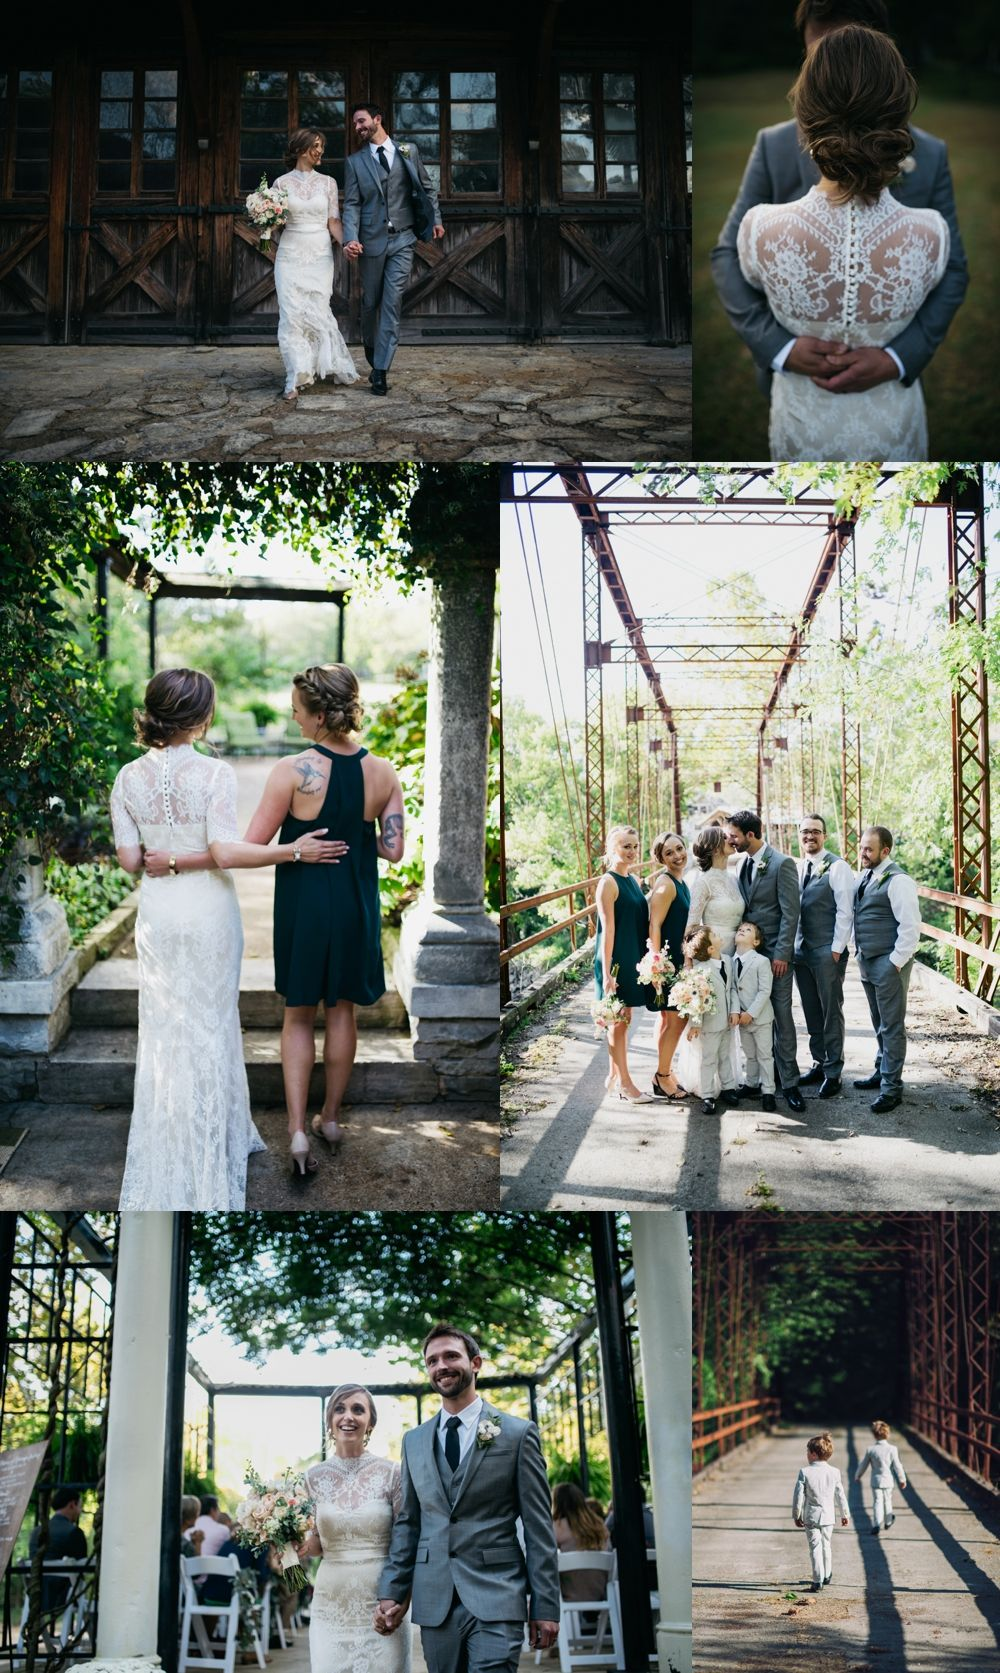 Lalumonre River Mill And Gardens Wedding St Louis Venues Unique Venue Outdoor Charis Rowland Photography